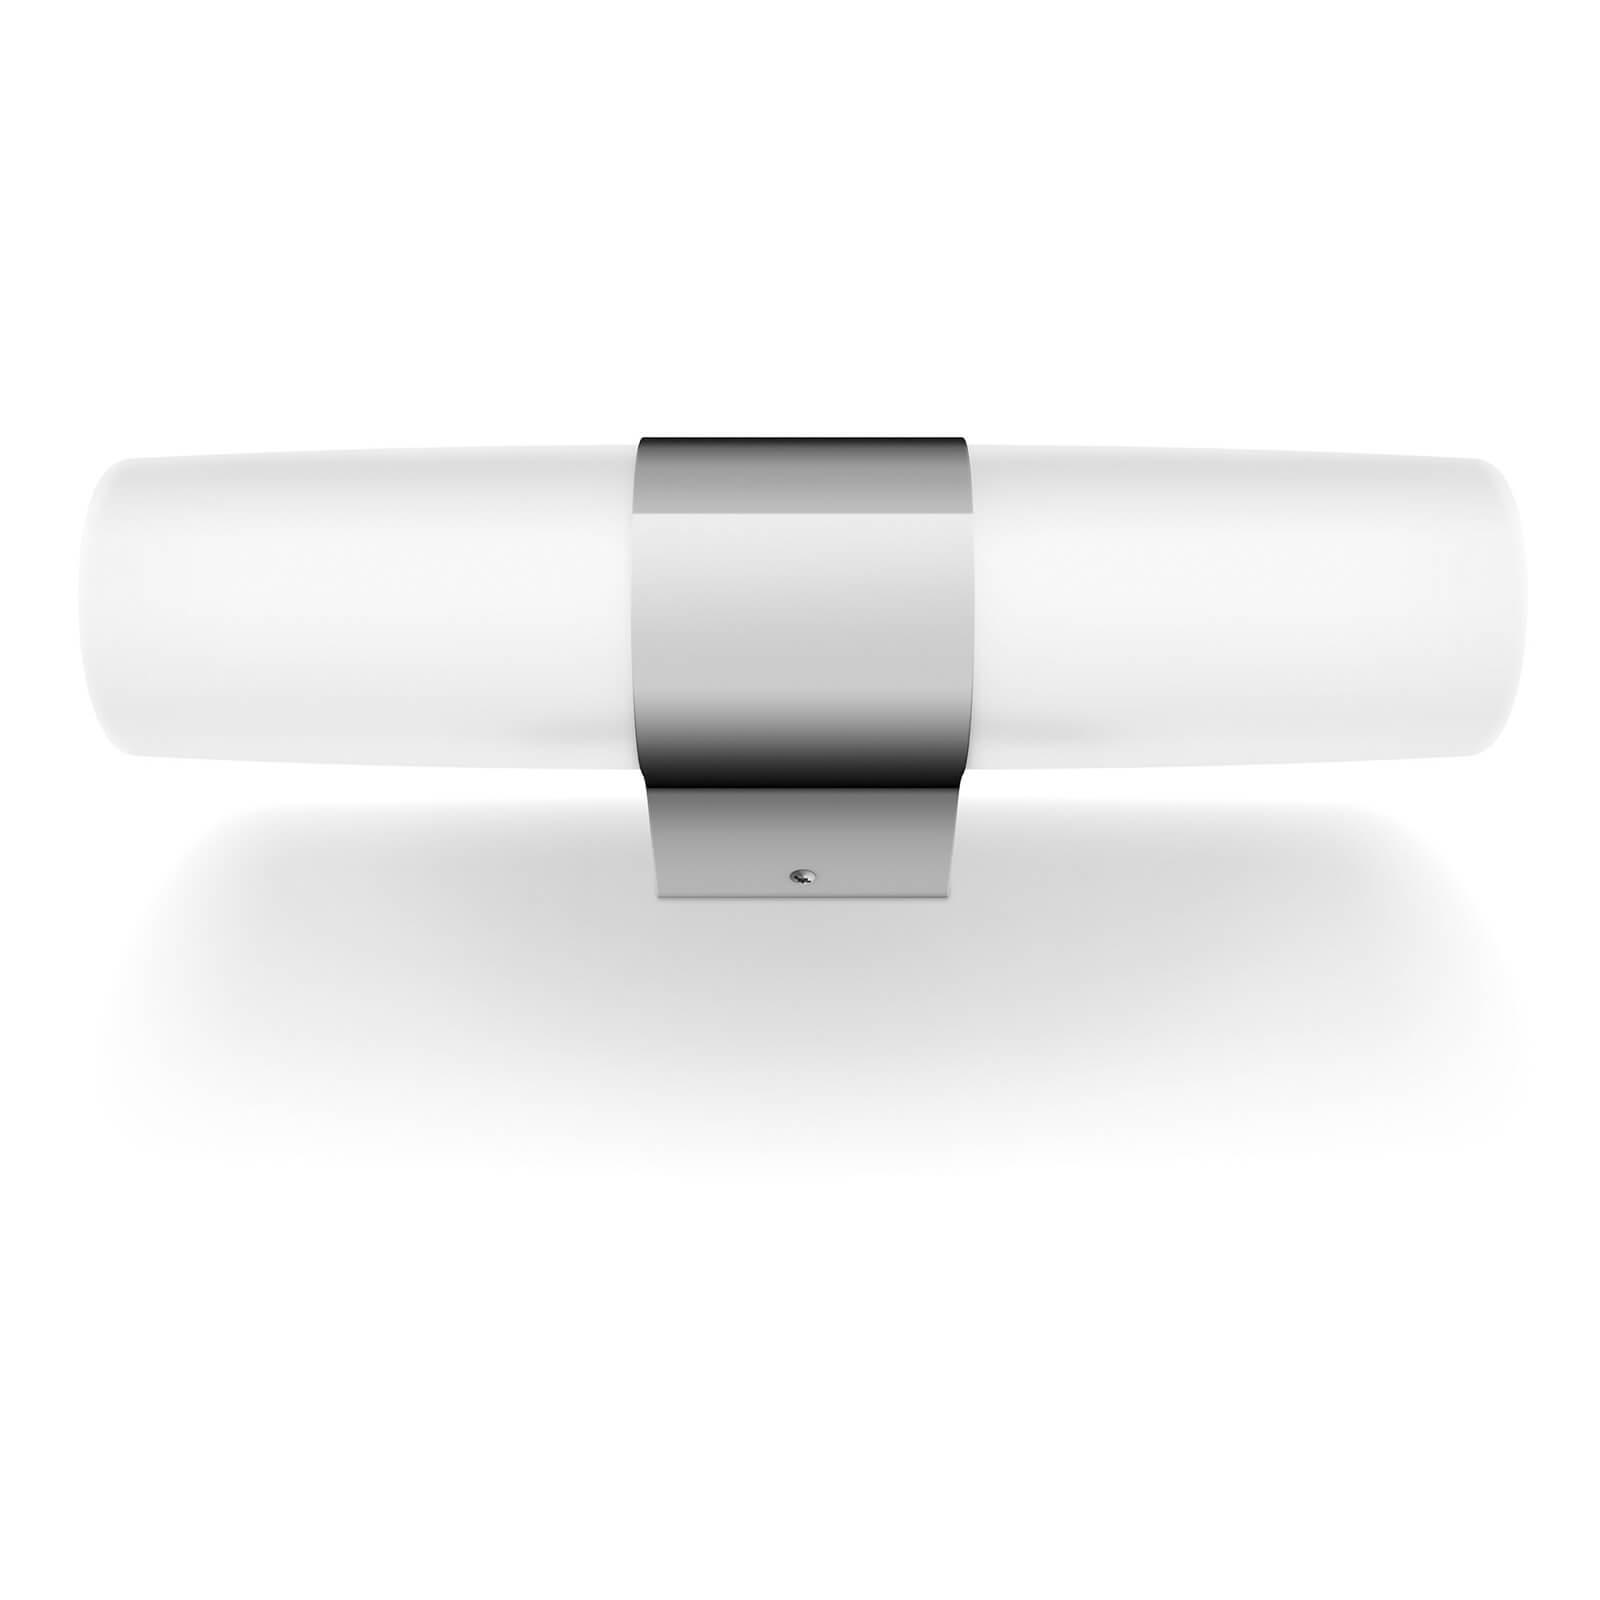 philips mybathroom skin wandlamp chroom 28cm. Black Bedroom Furniture Sets. Home Design Ideas